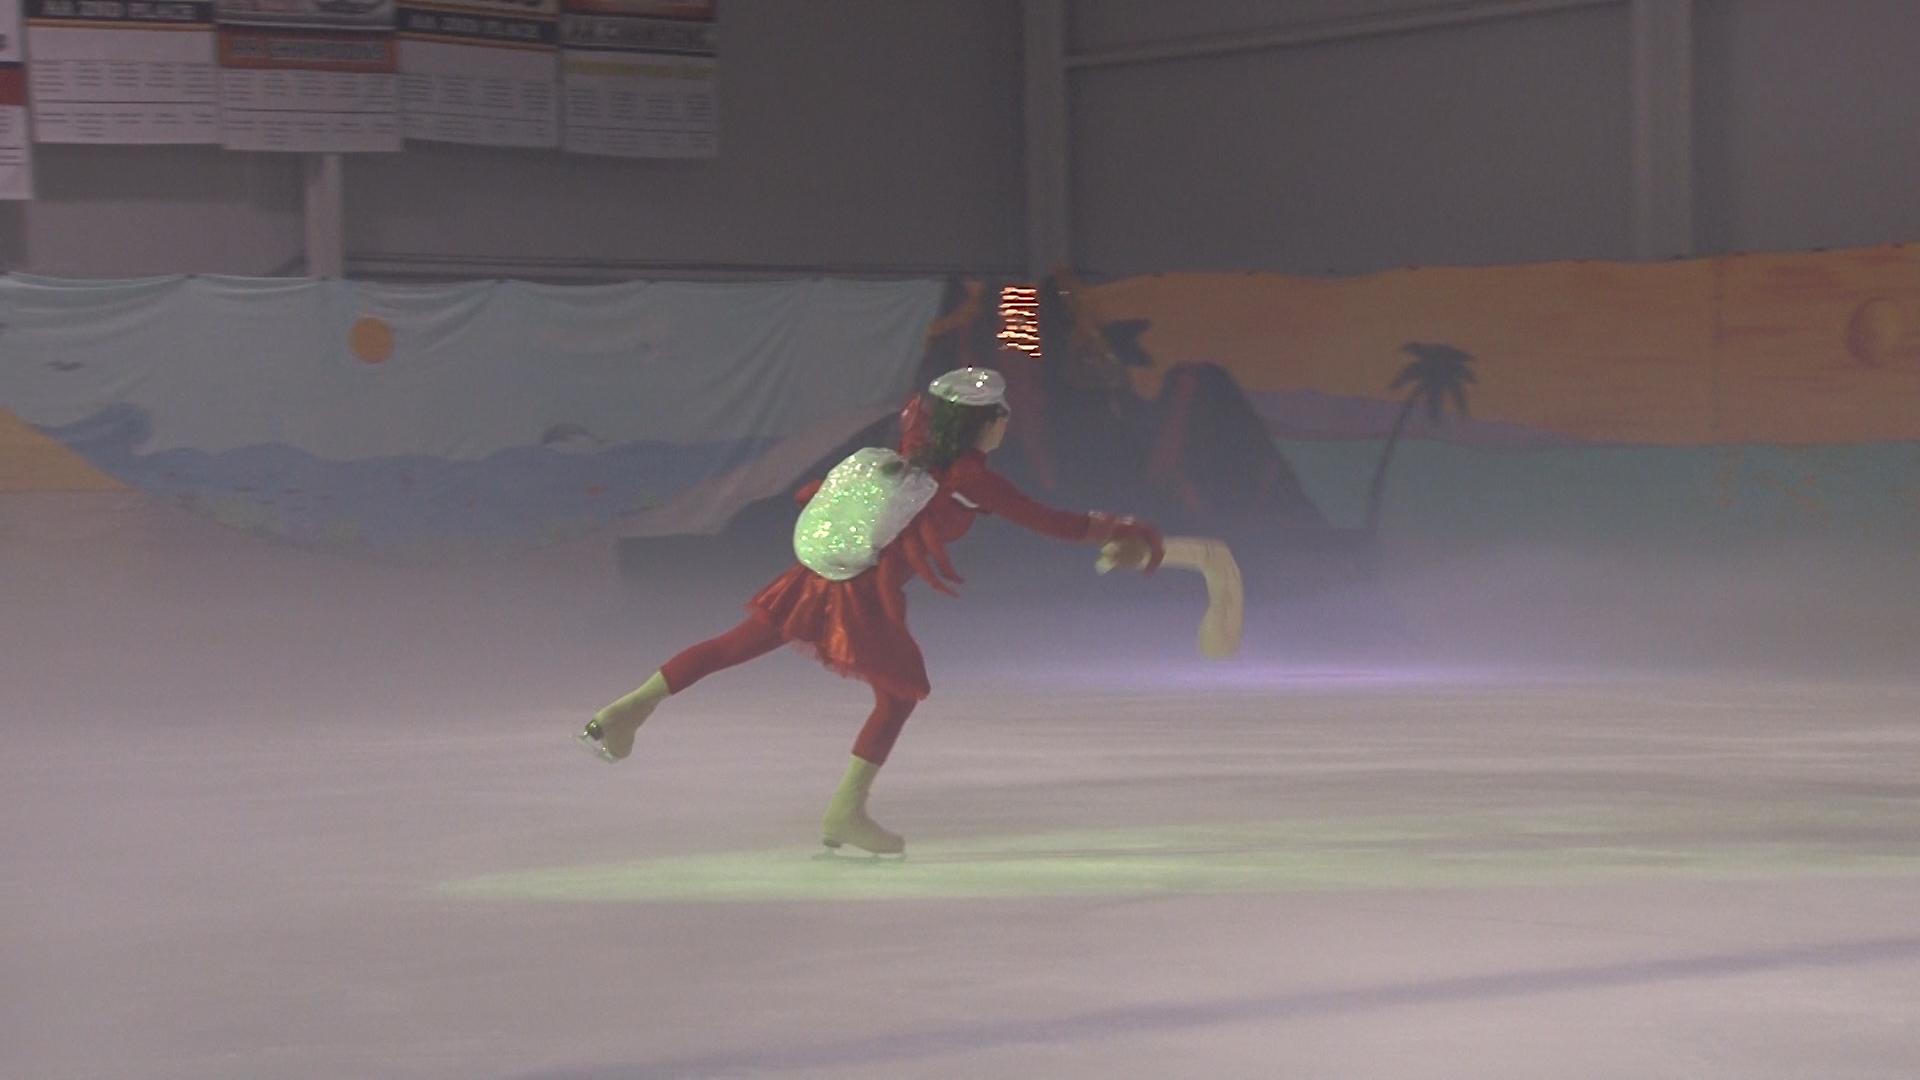 Power Play Maui Skate on Ice 071417.00_42_55_11.Still064.jpg